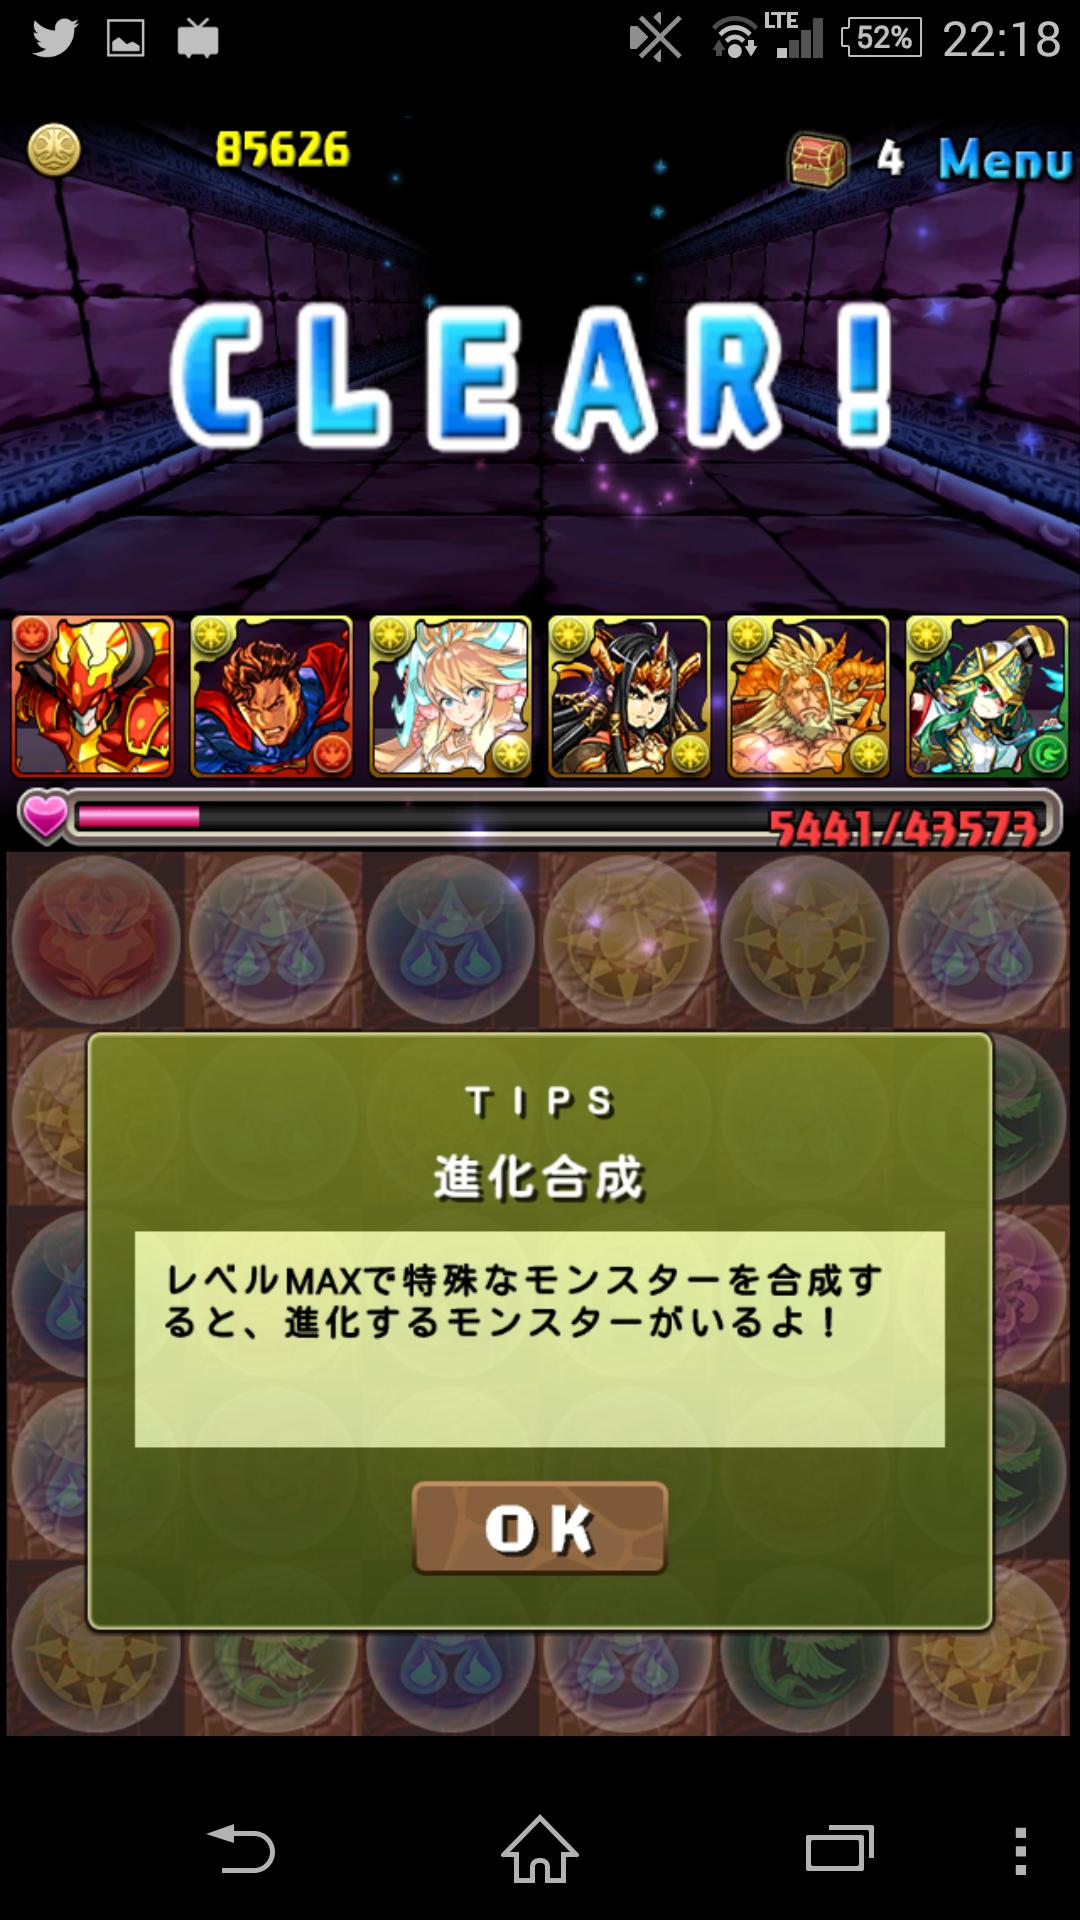 Screenshot_2015-01-24-22-18-22.png